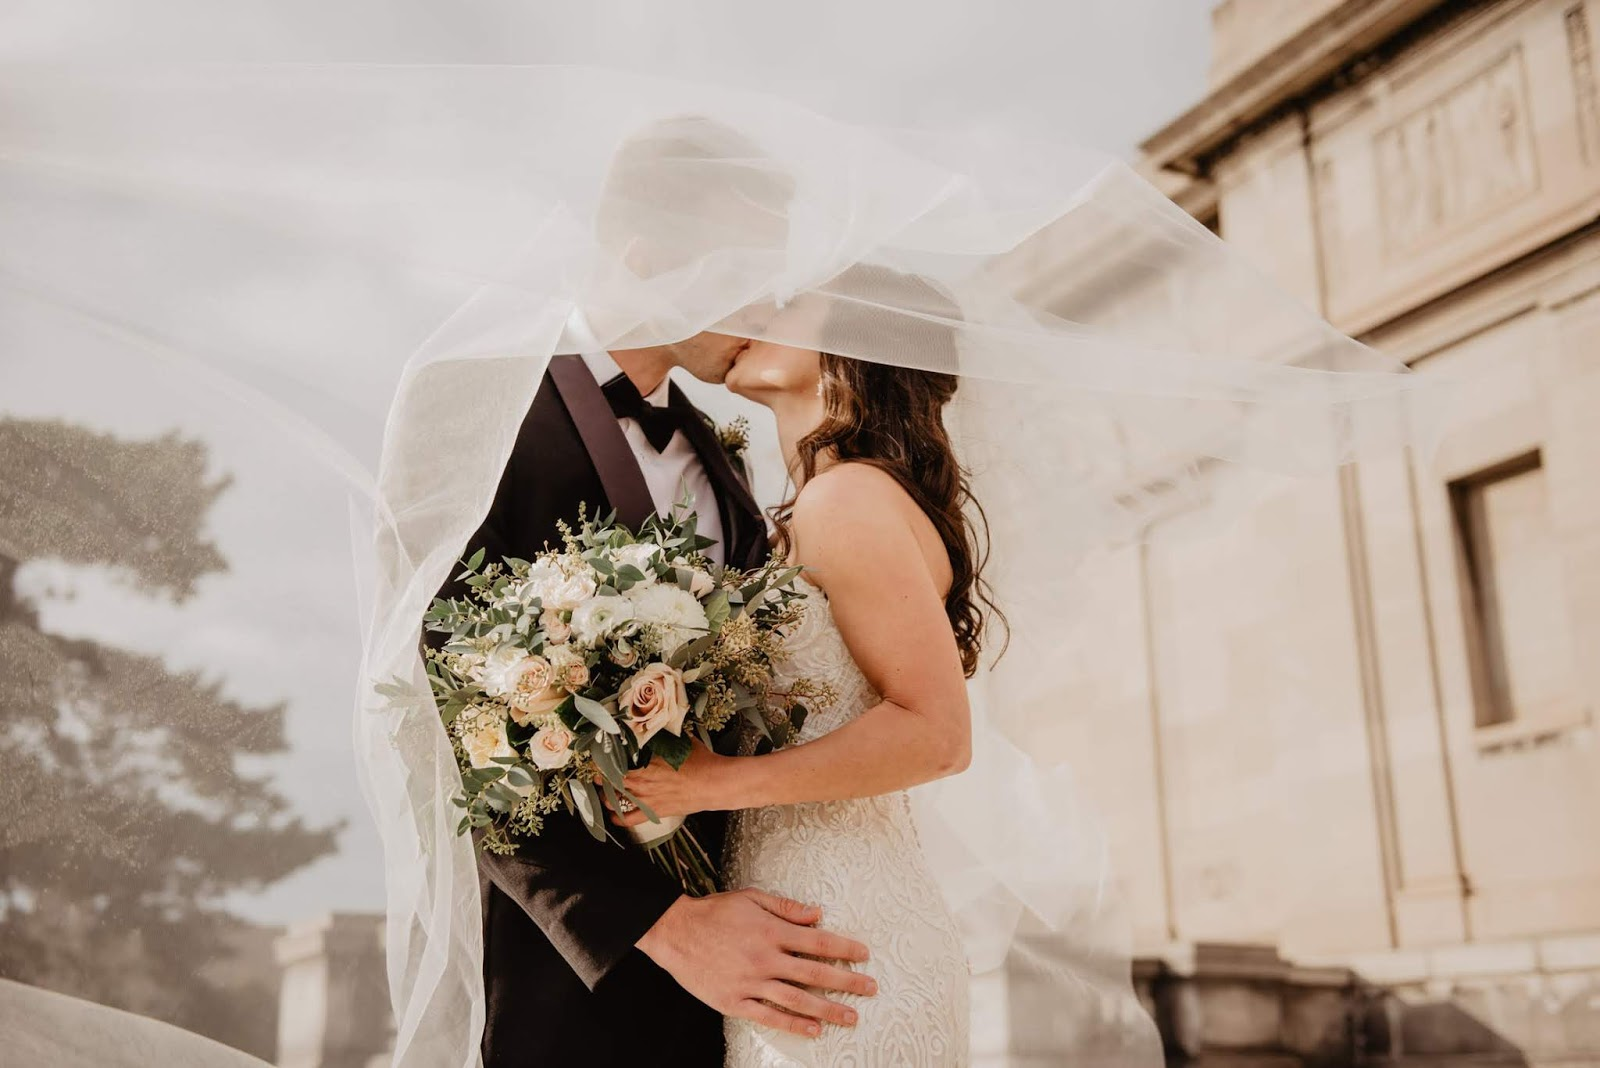 Manage Finances as a Couple